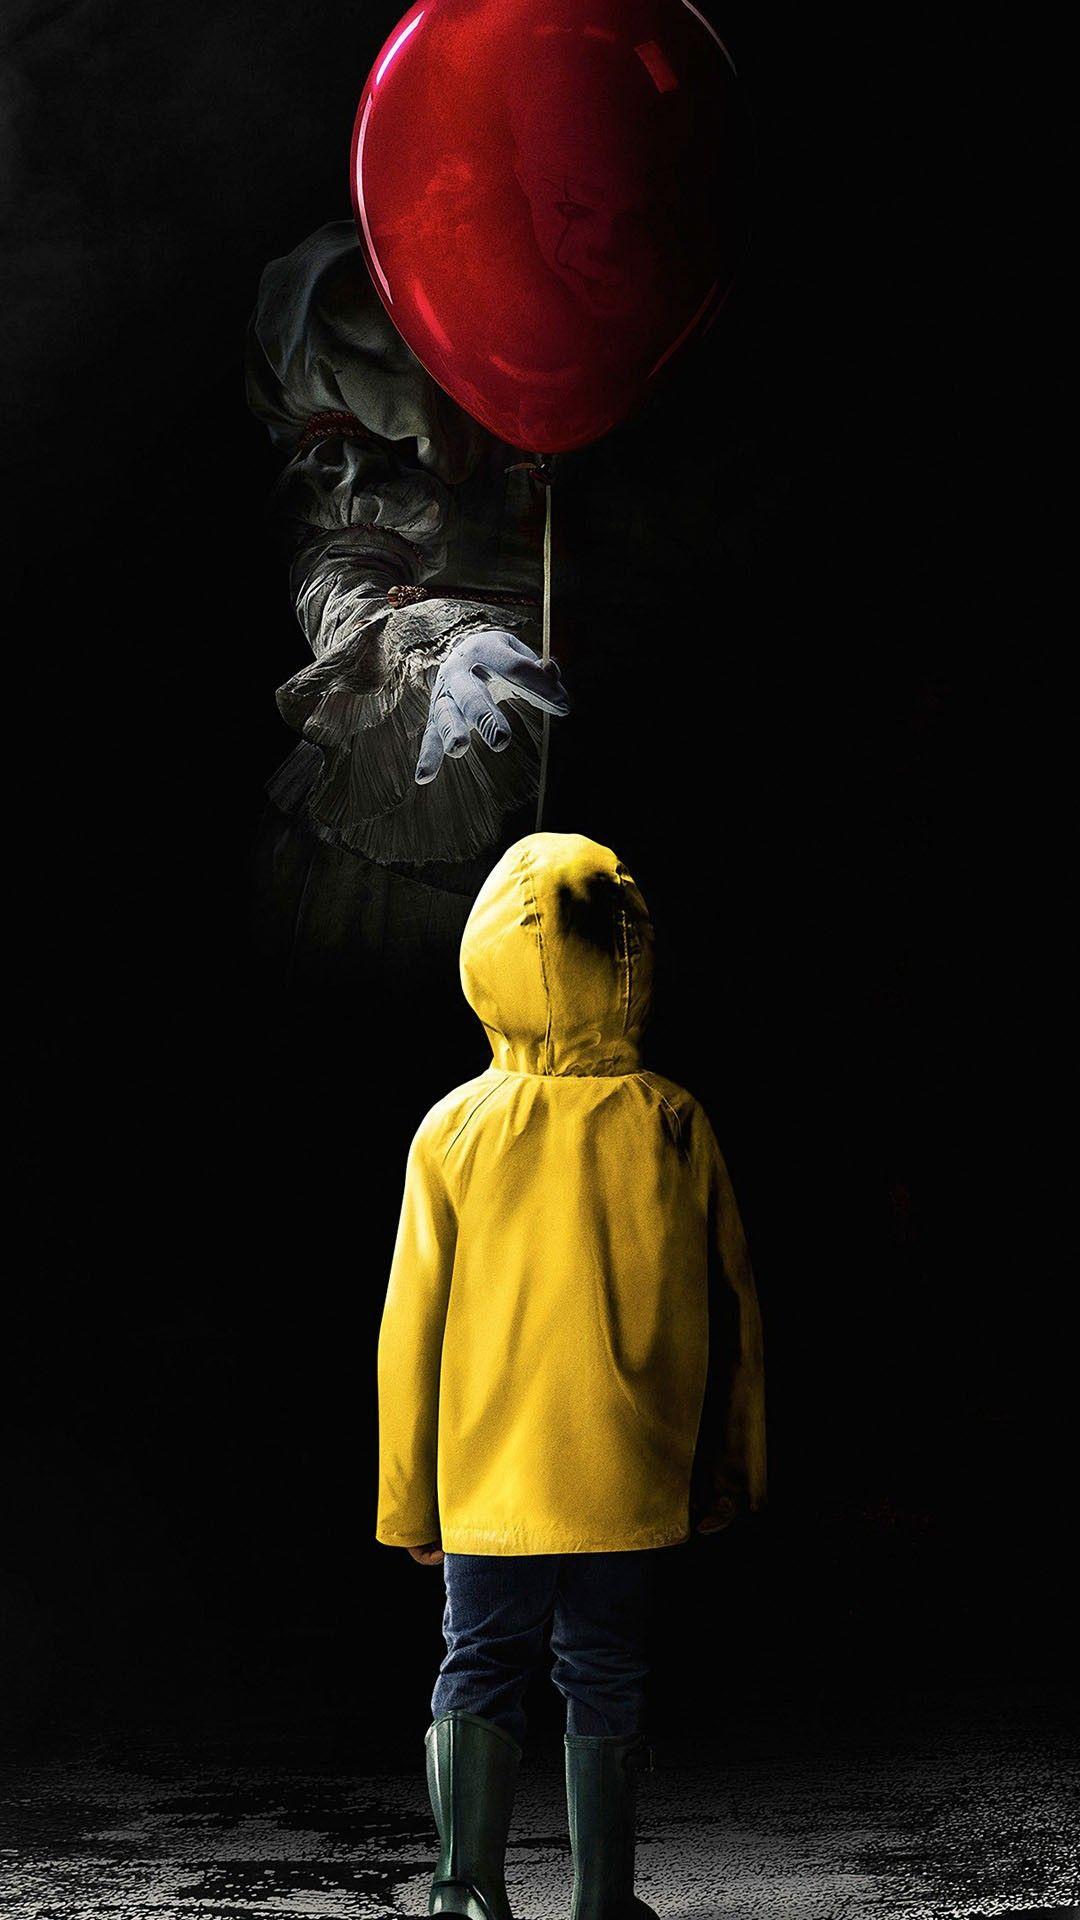 Epingle Par Ariana Moran Bernaola Sur Cinema Fond D Ecran Film Personnage Film Horreur Fond Ecran Halloween